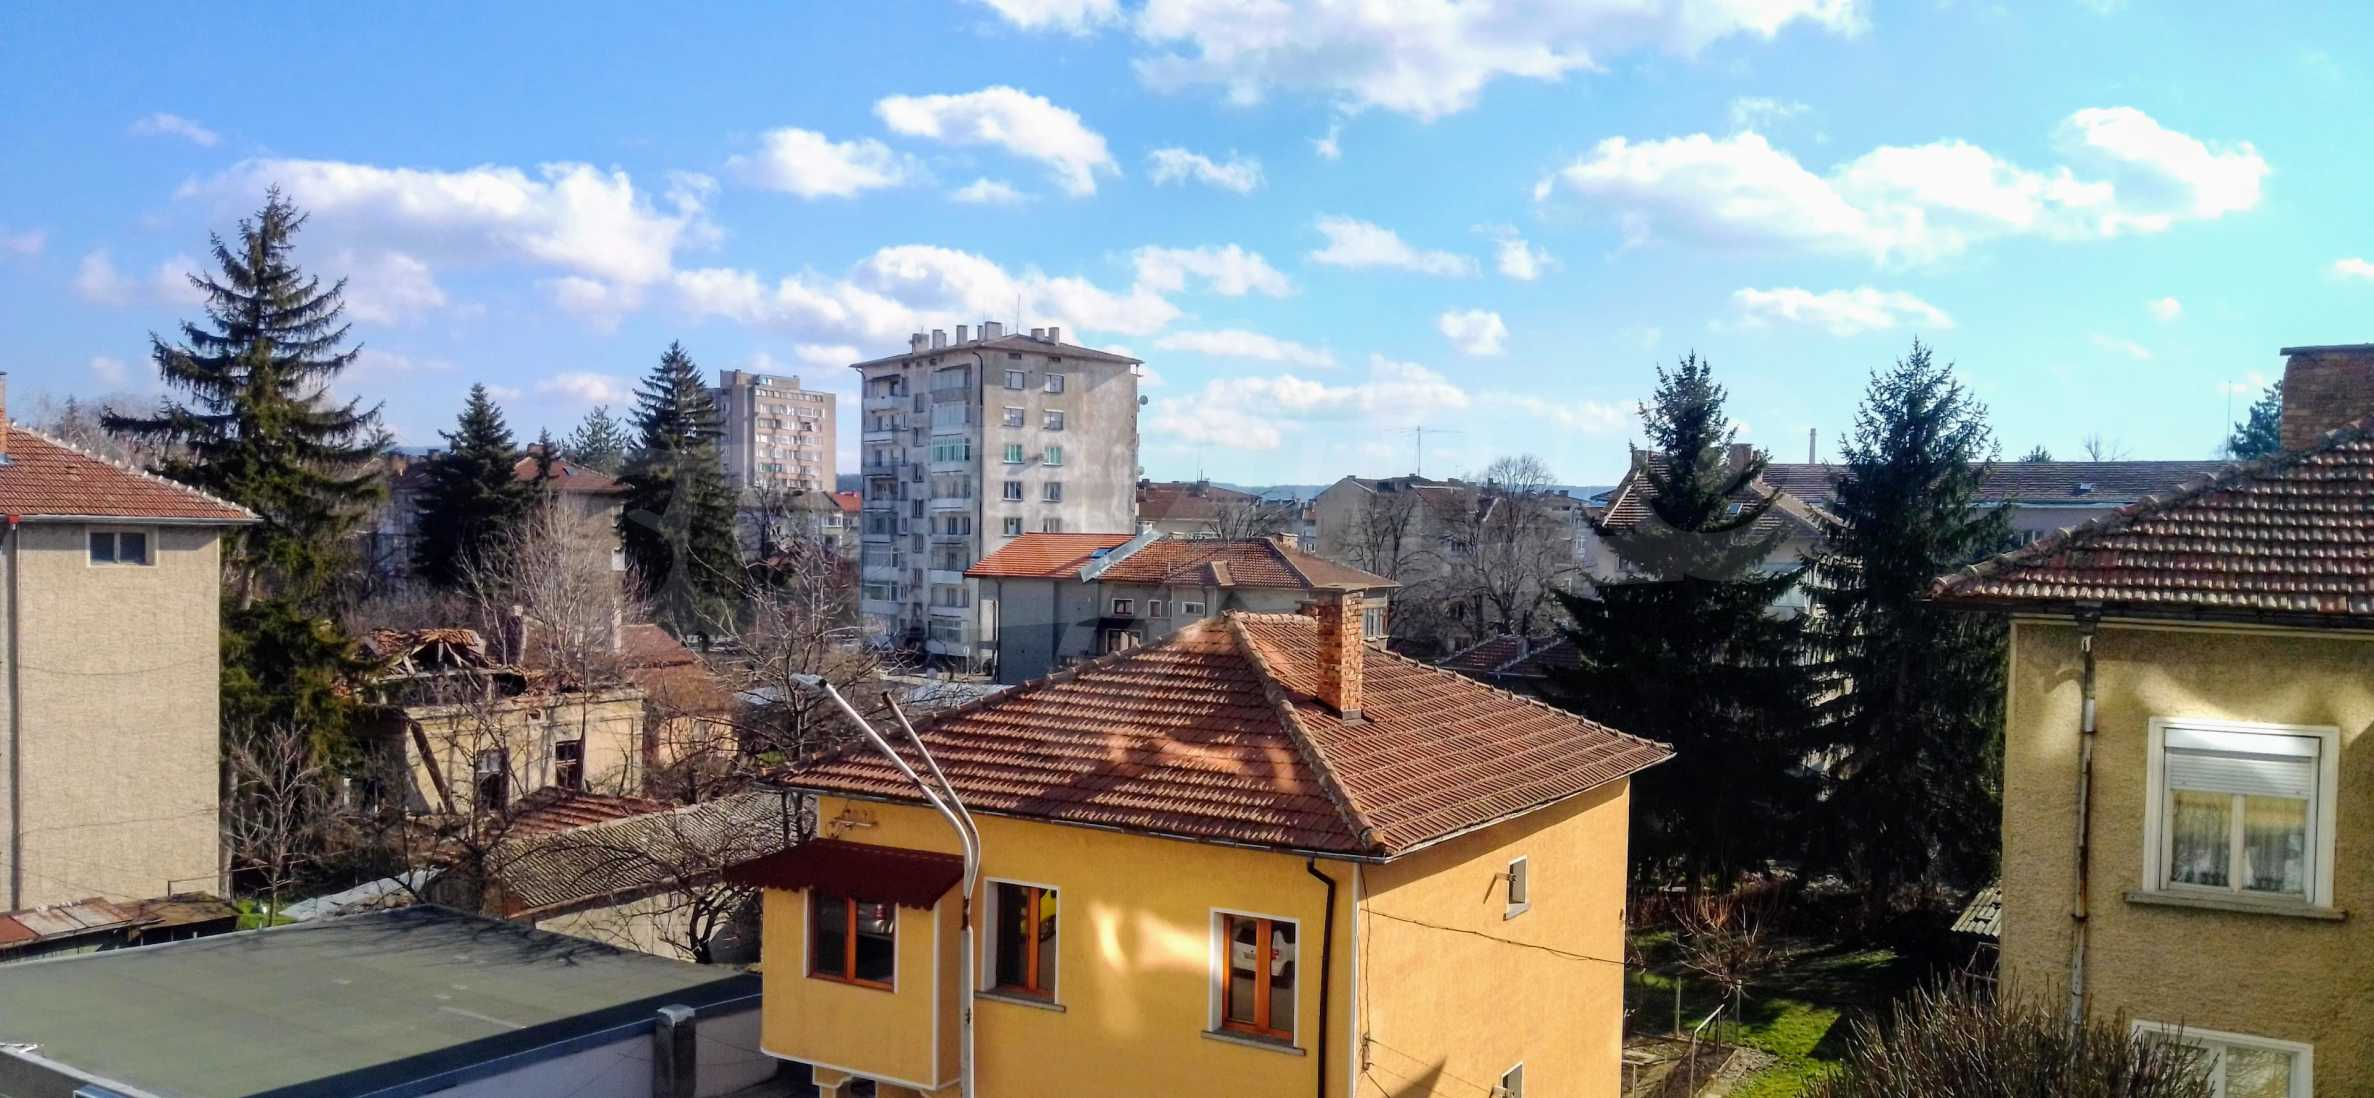 Слънчев тристаен апартамент в град Севлиево